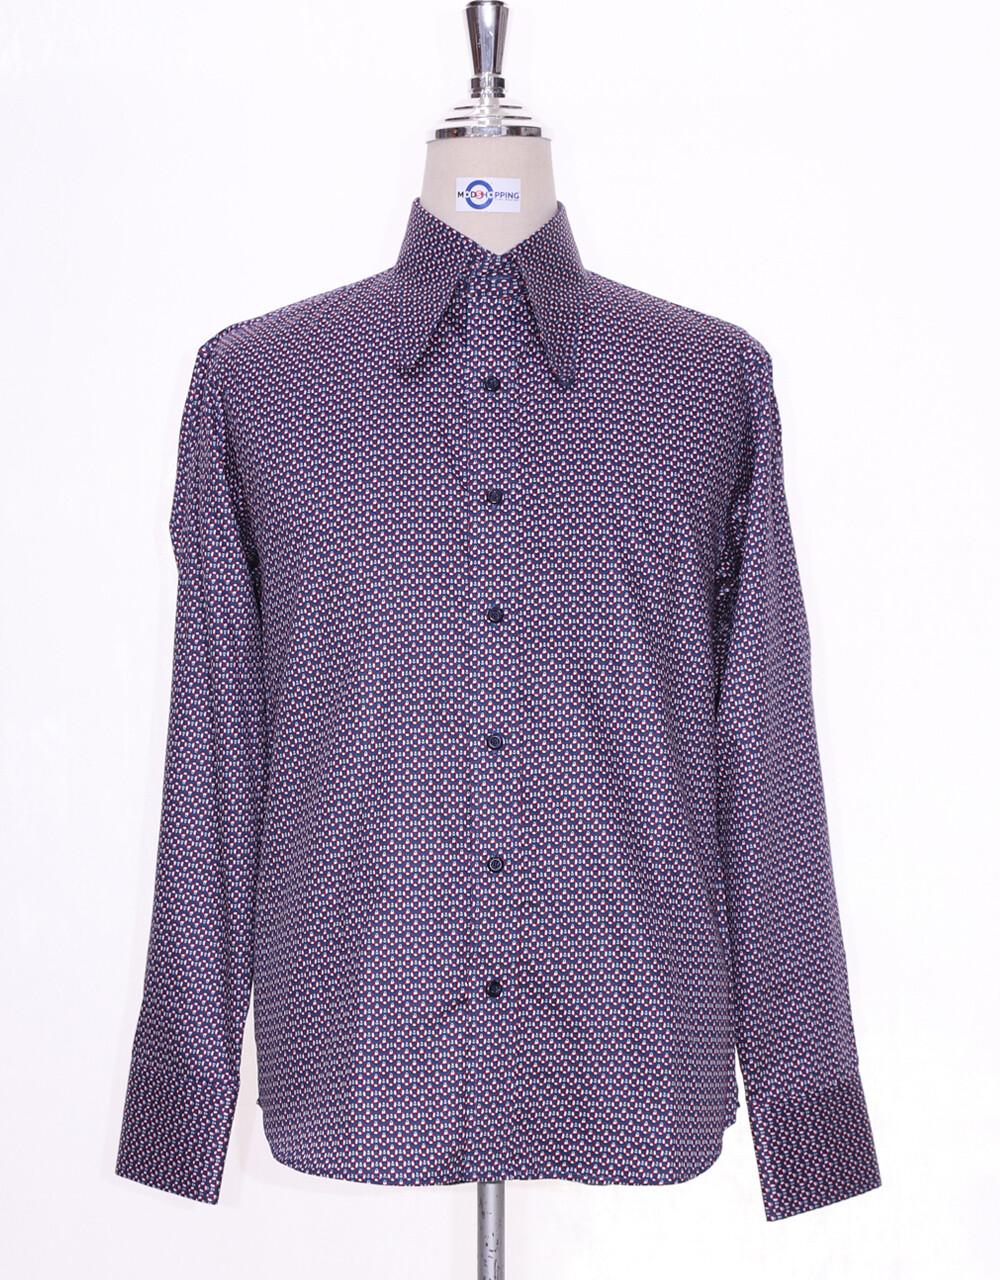 Hight Penny Collar Shirt | Multi Color Circle Pattern Shirt